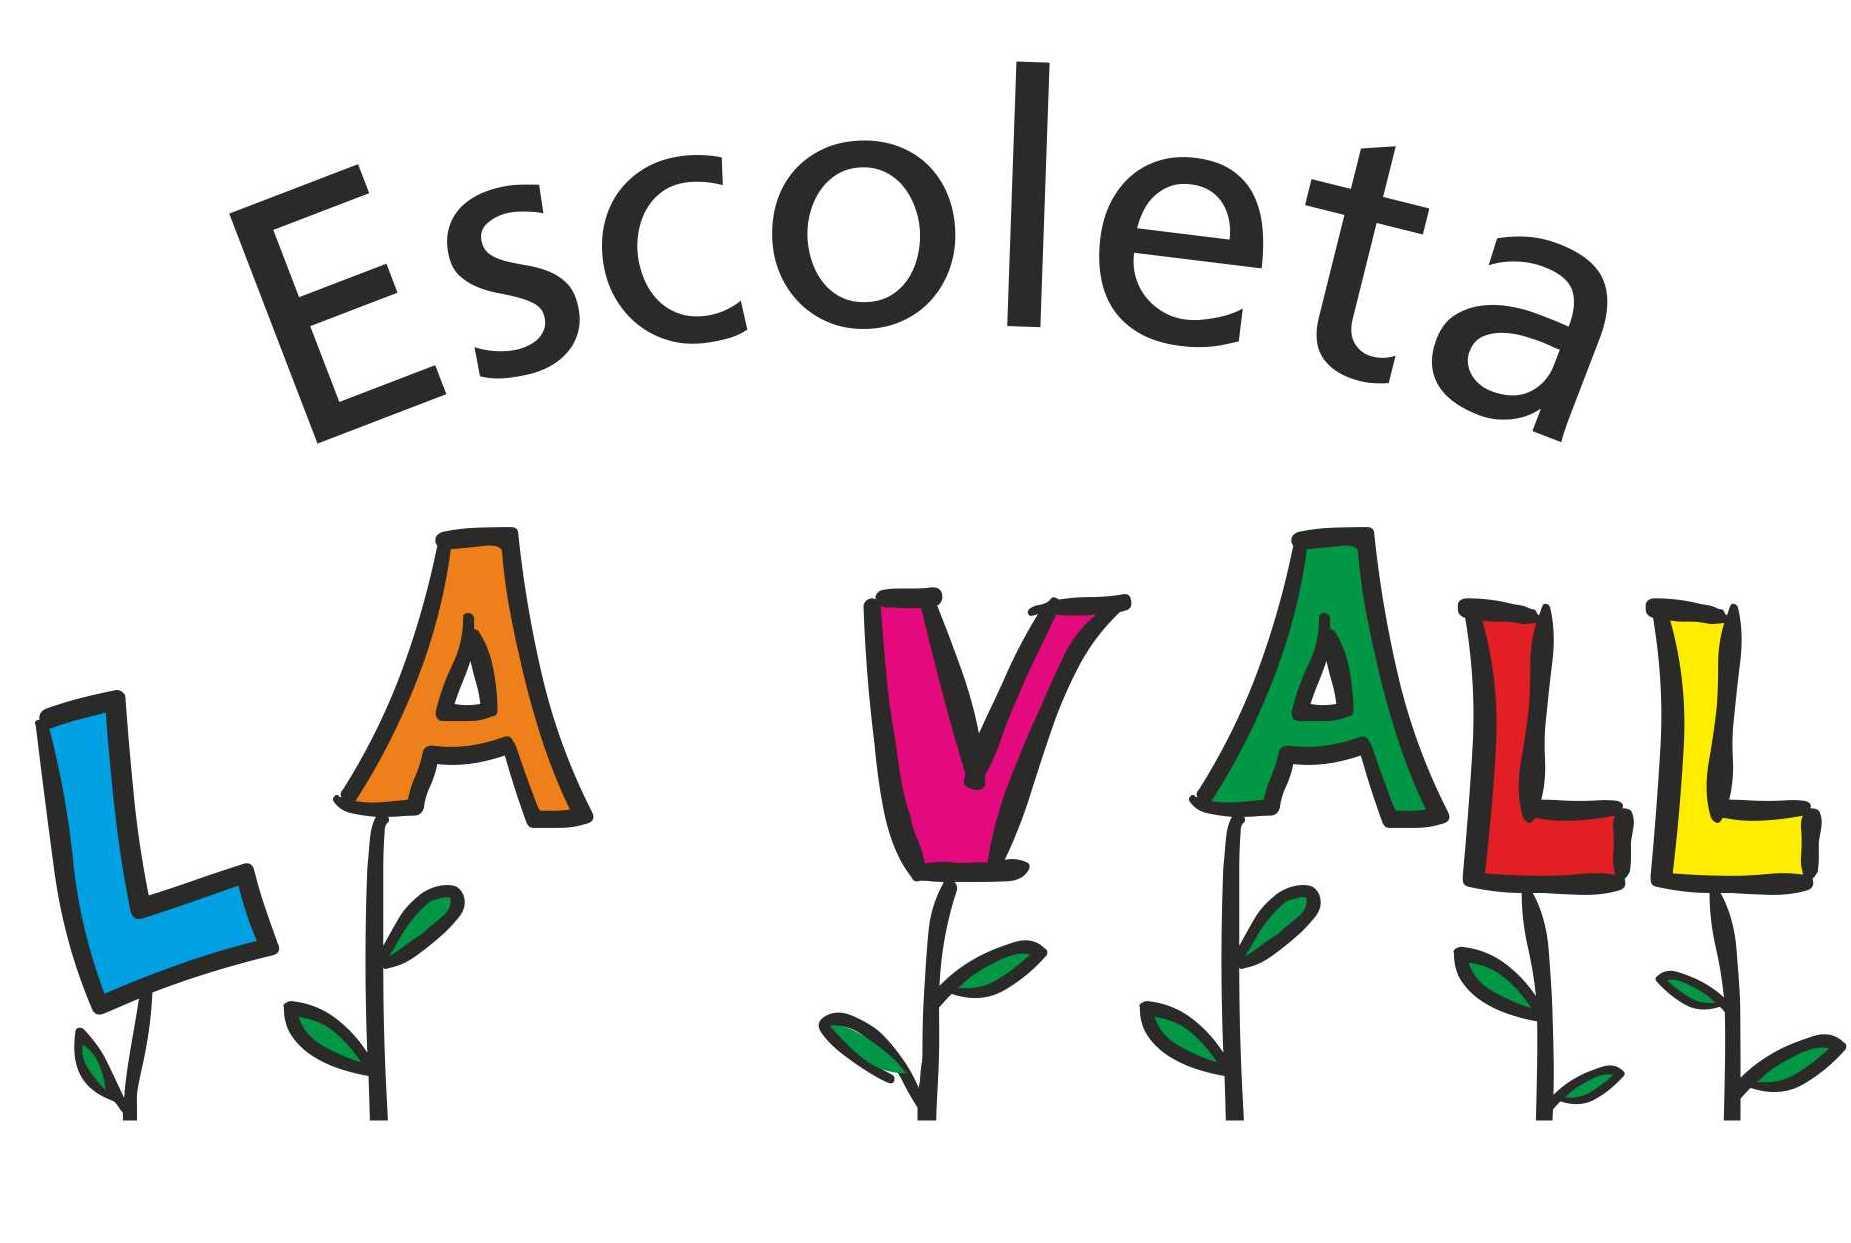 Escoleta La Vall